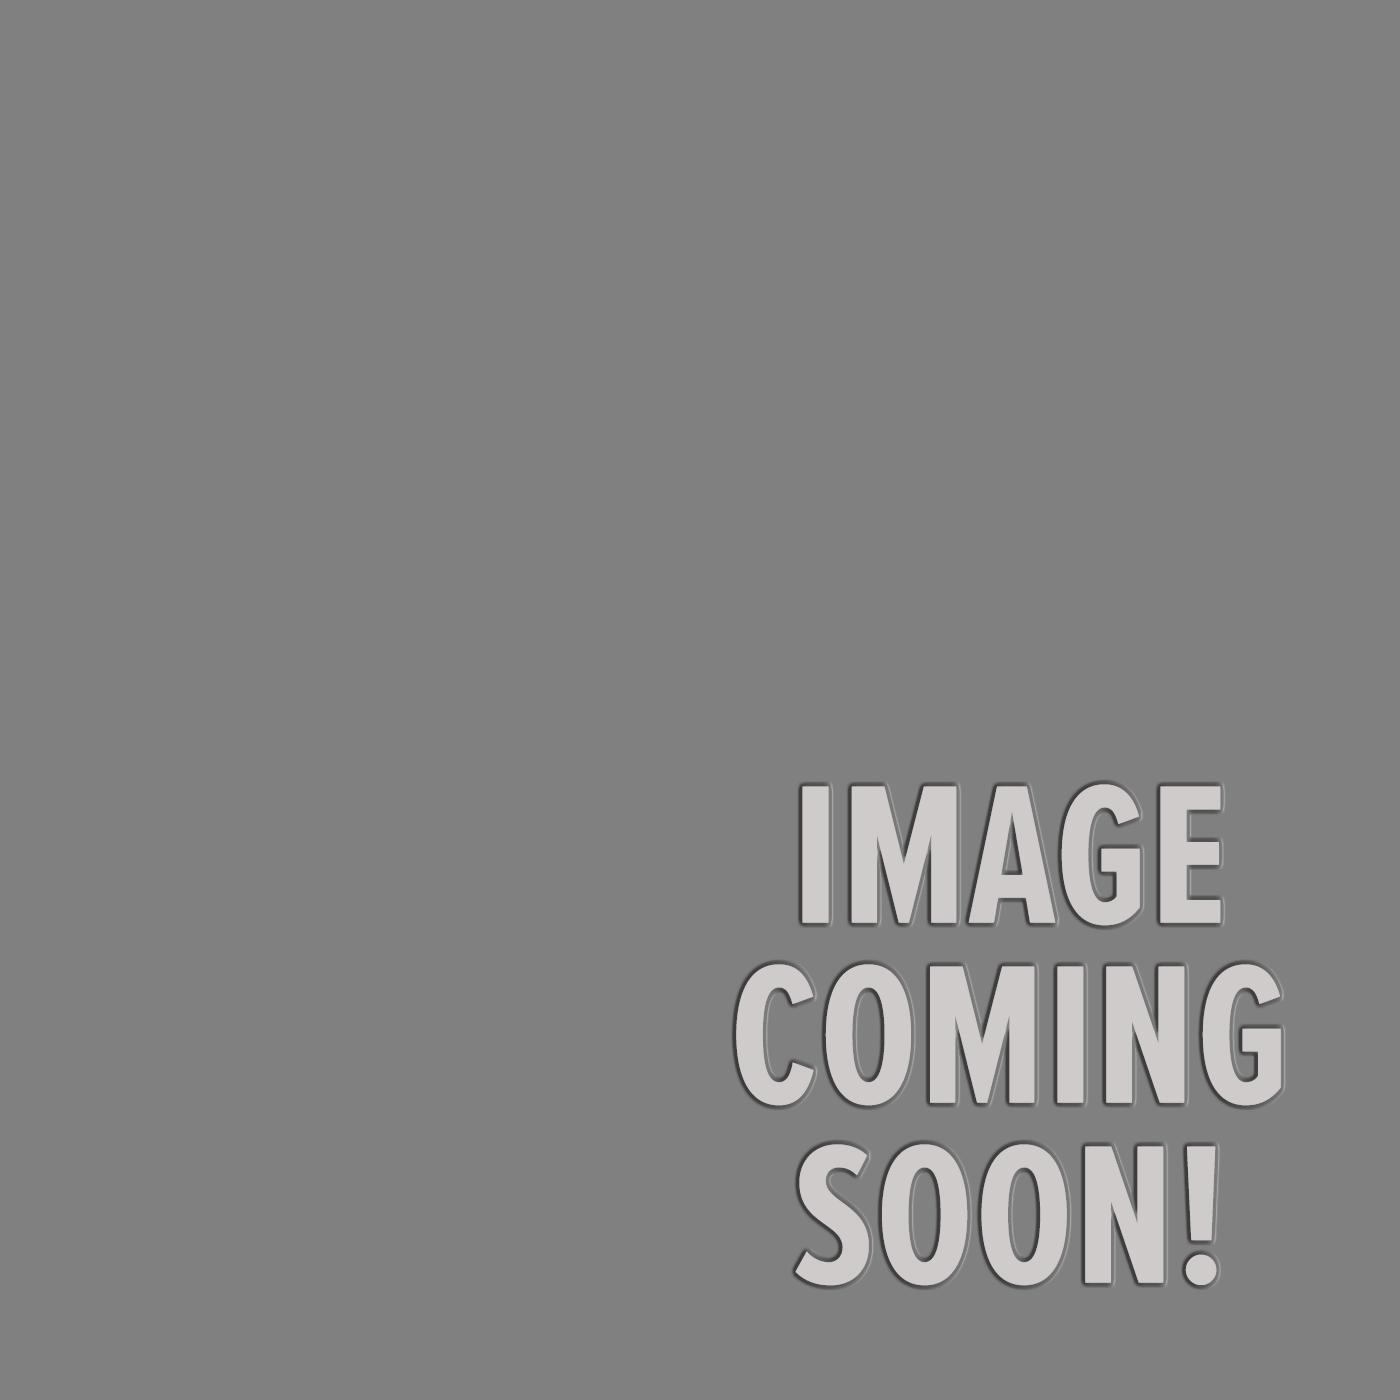 Image for EJ16 Light Phosphor Bronze Acoustic Guitar Strings from SamAsh